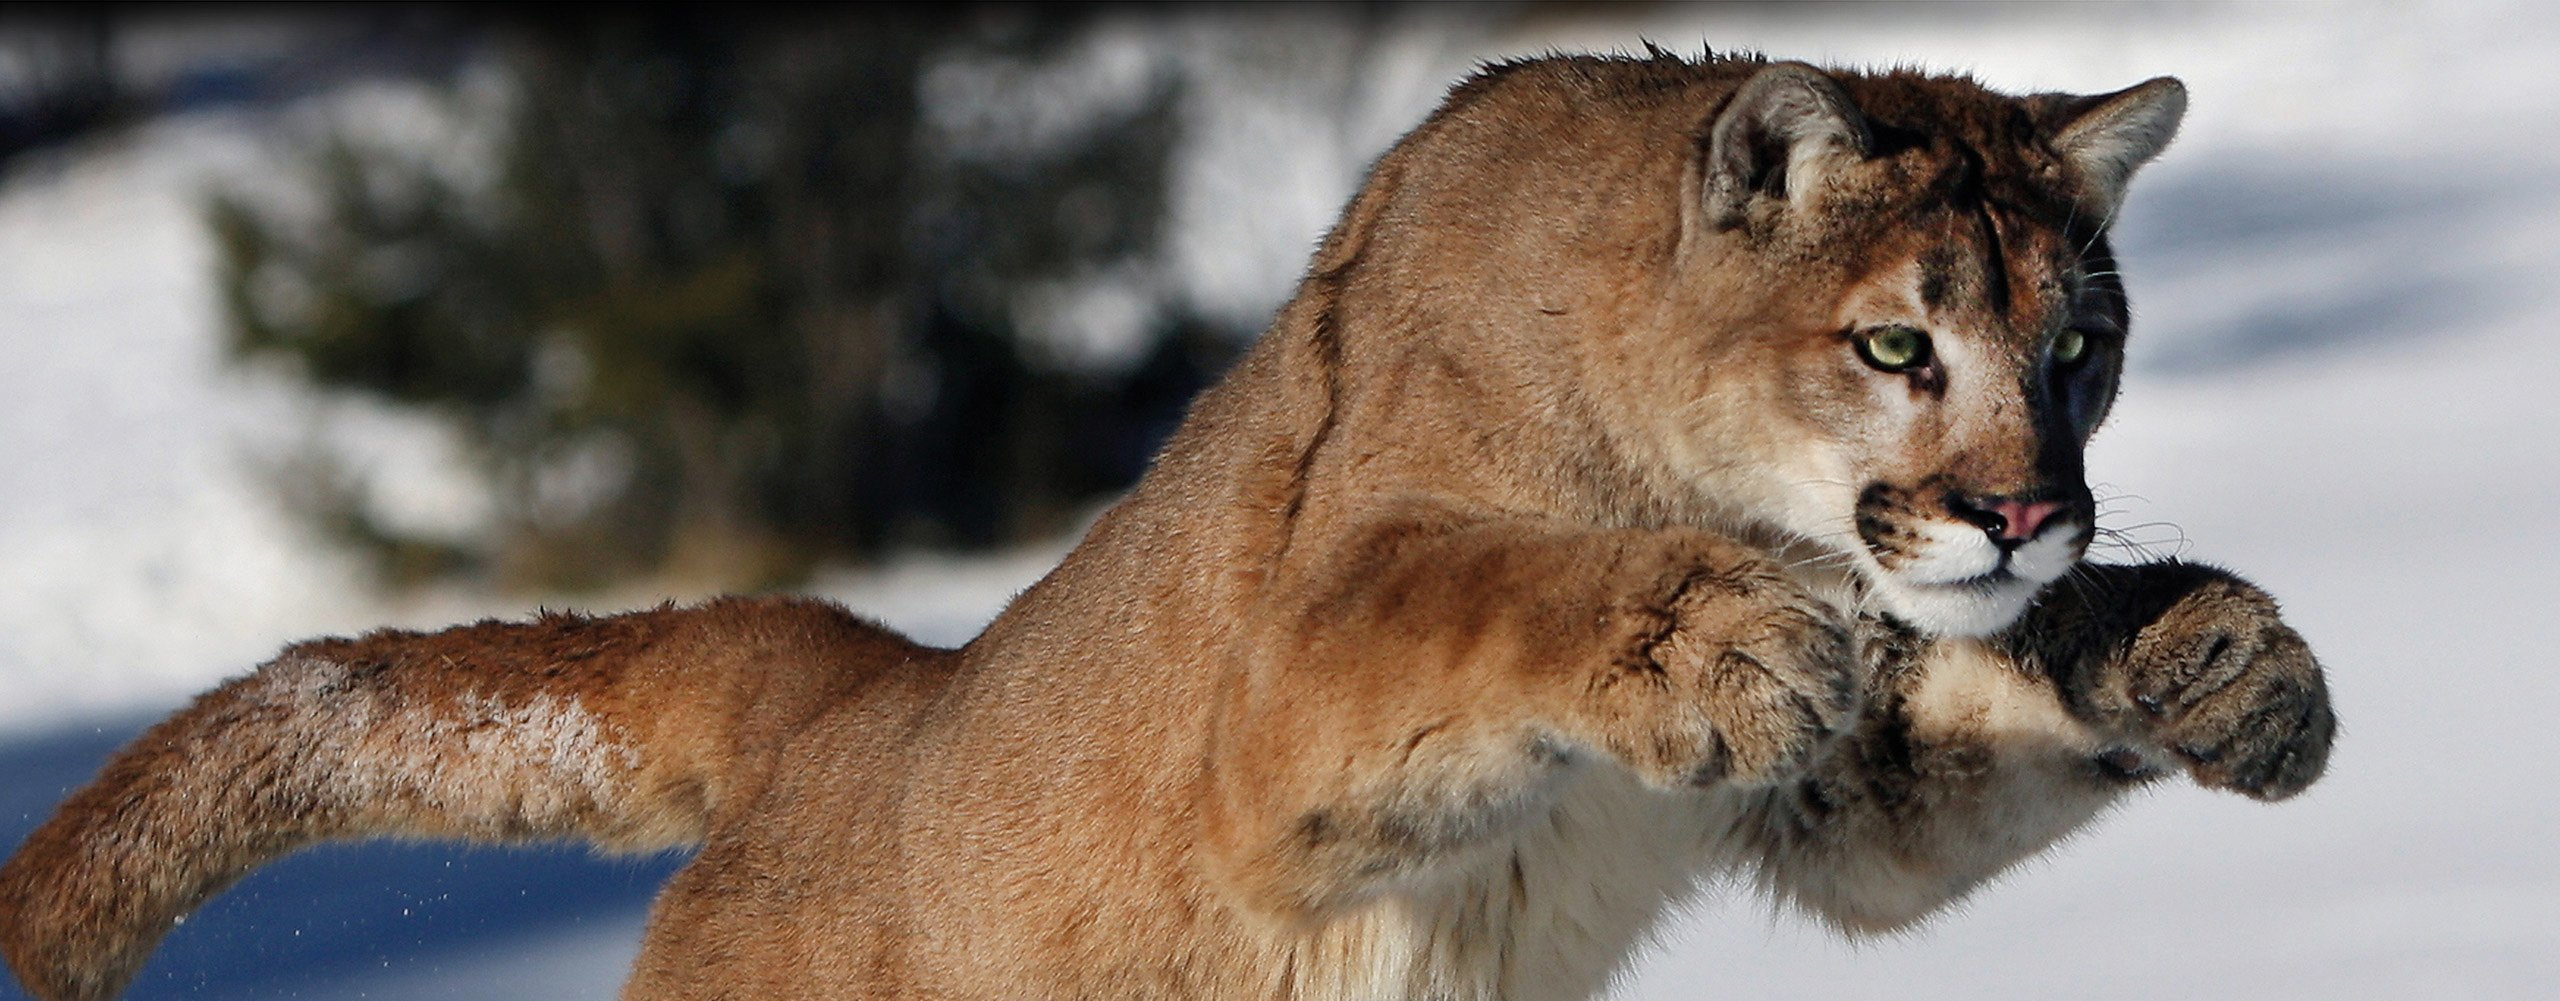 Puma of mountain lion